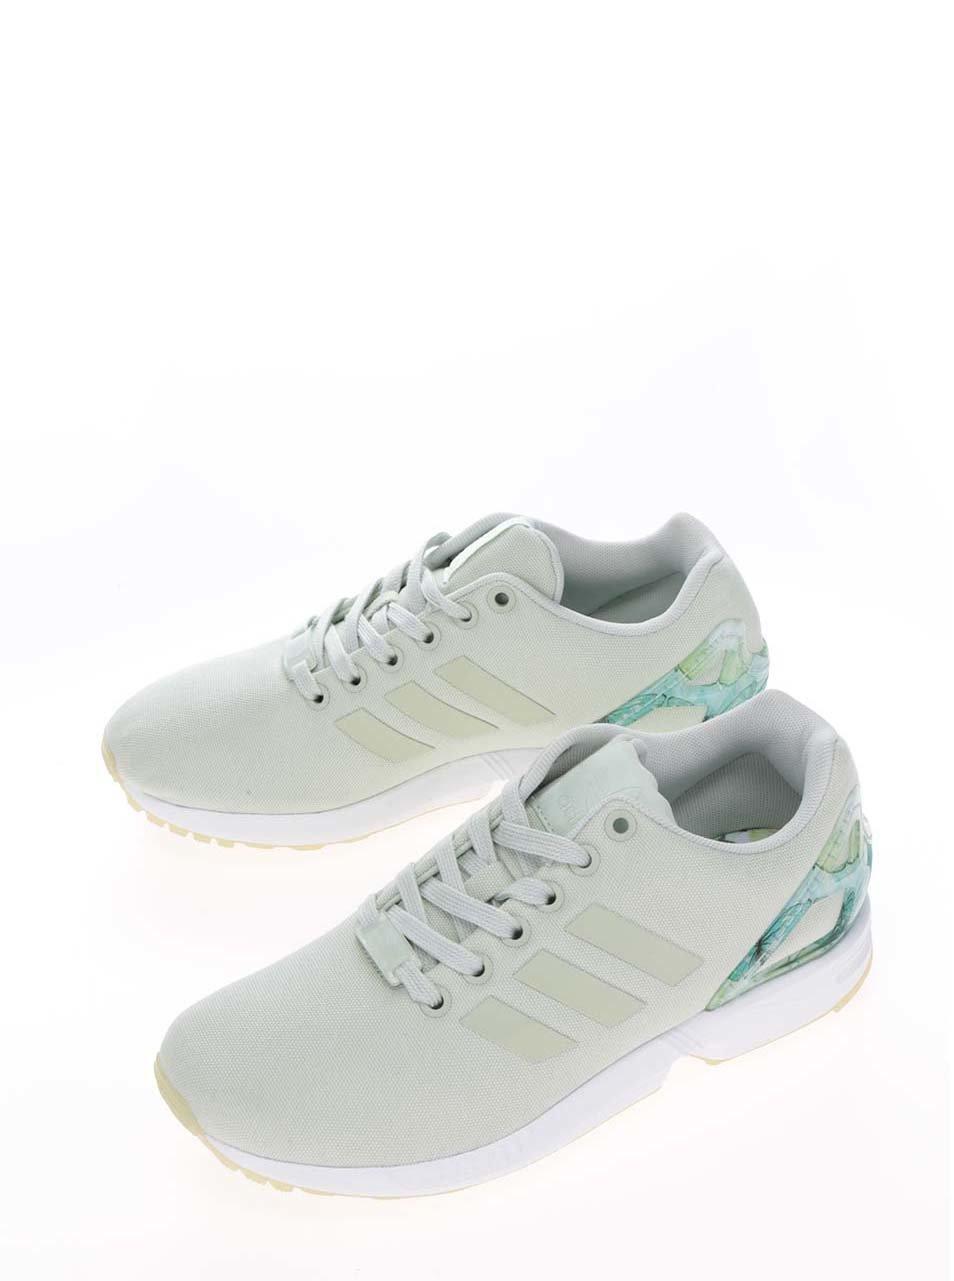 3580b85c4ca0 Svetlozelené dámske tenisky adidas Originals ZX Flux ...